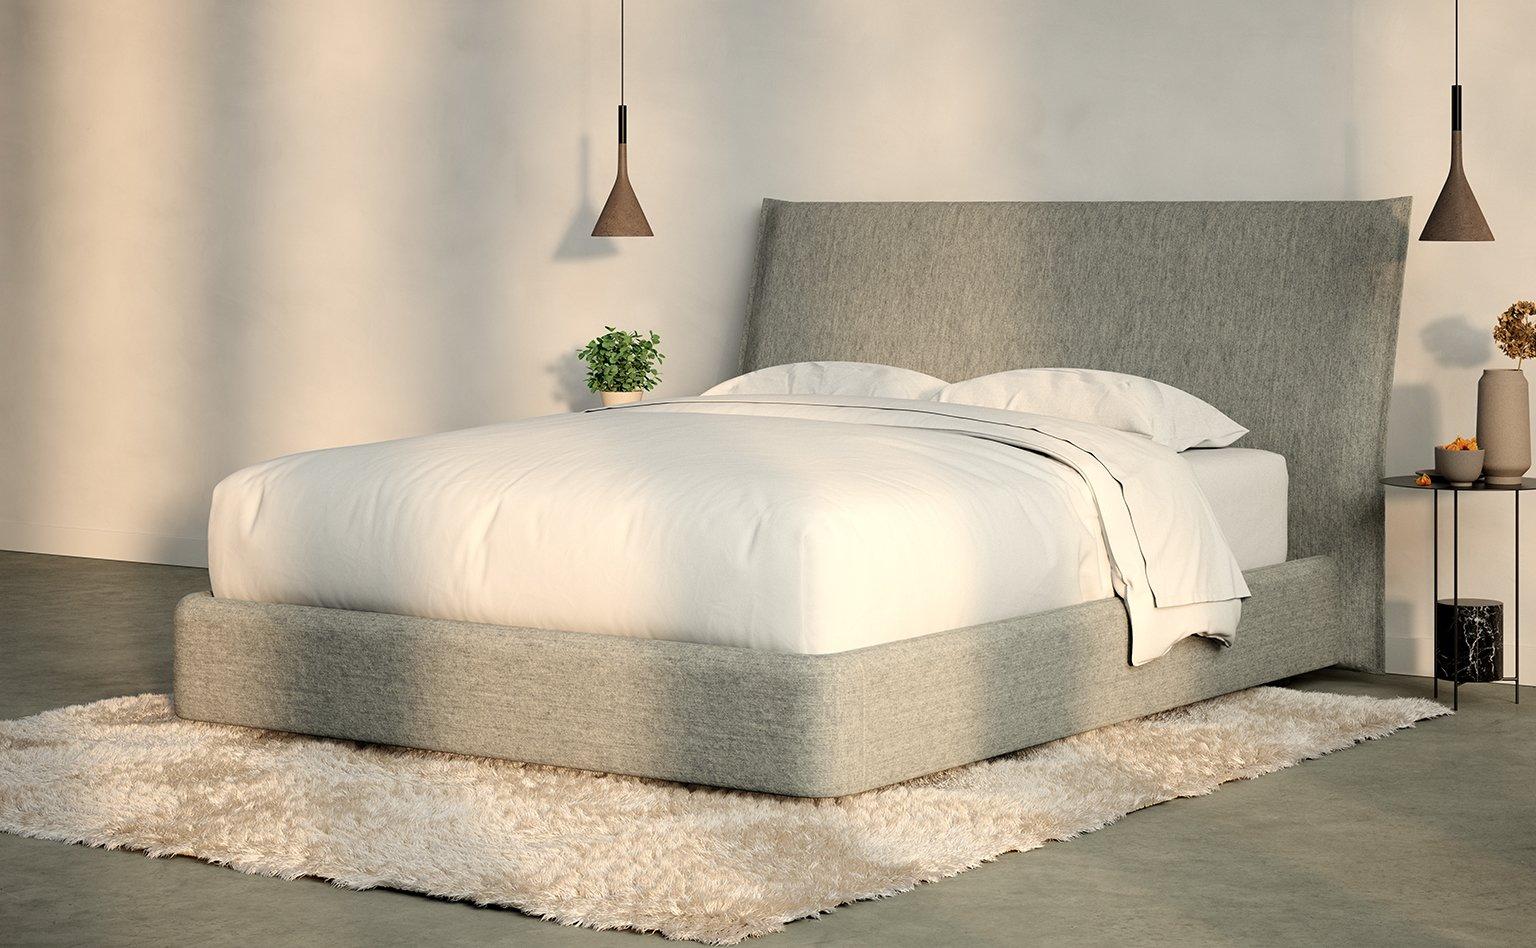 Casper's Haven bed frame.